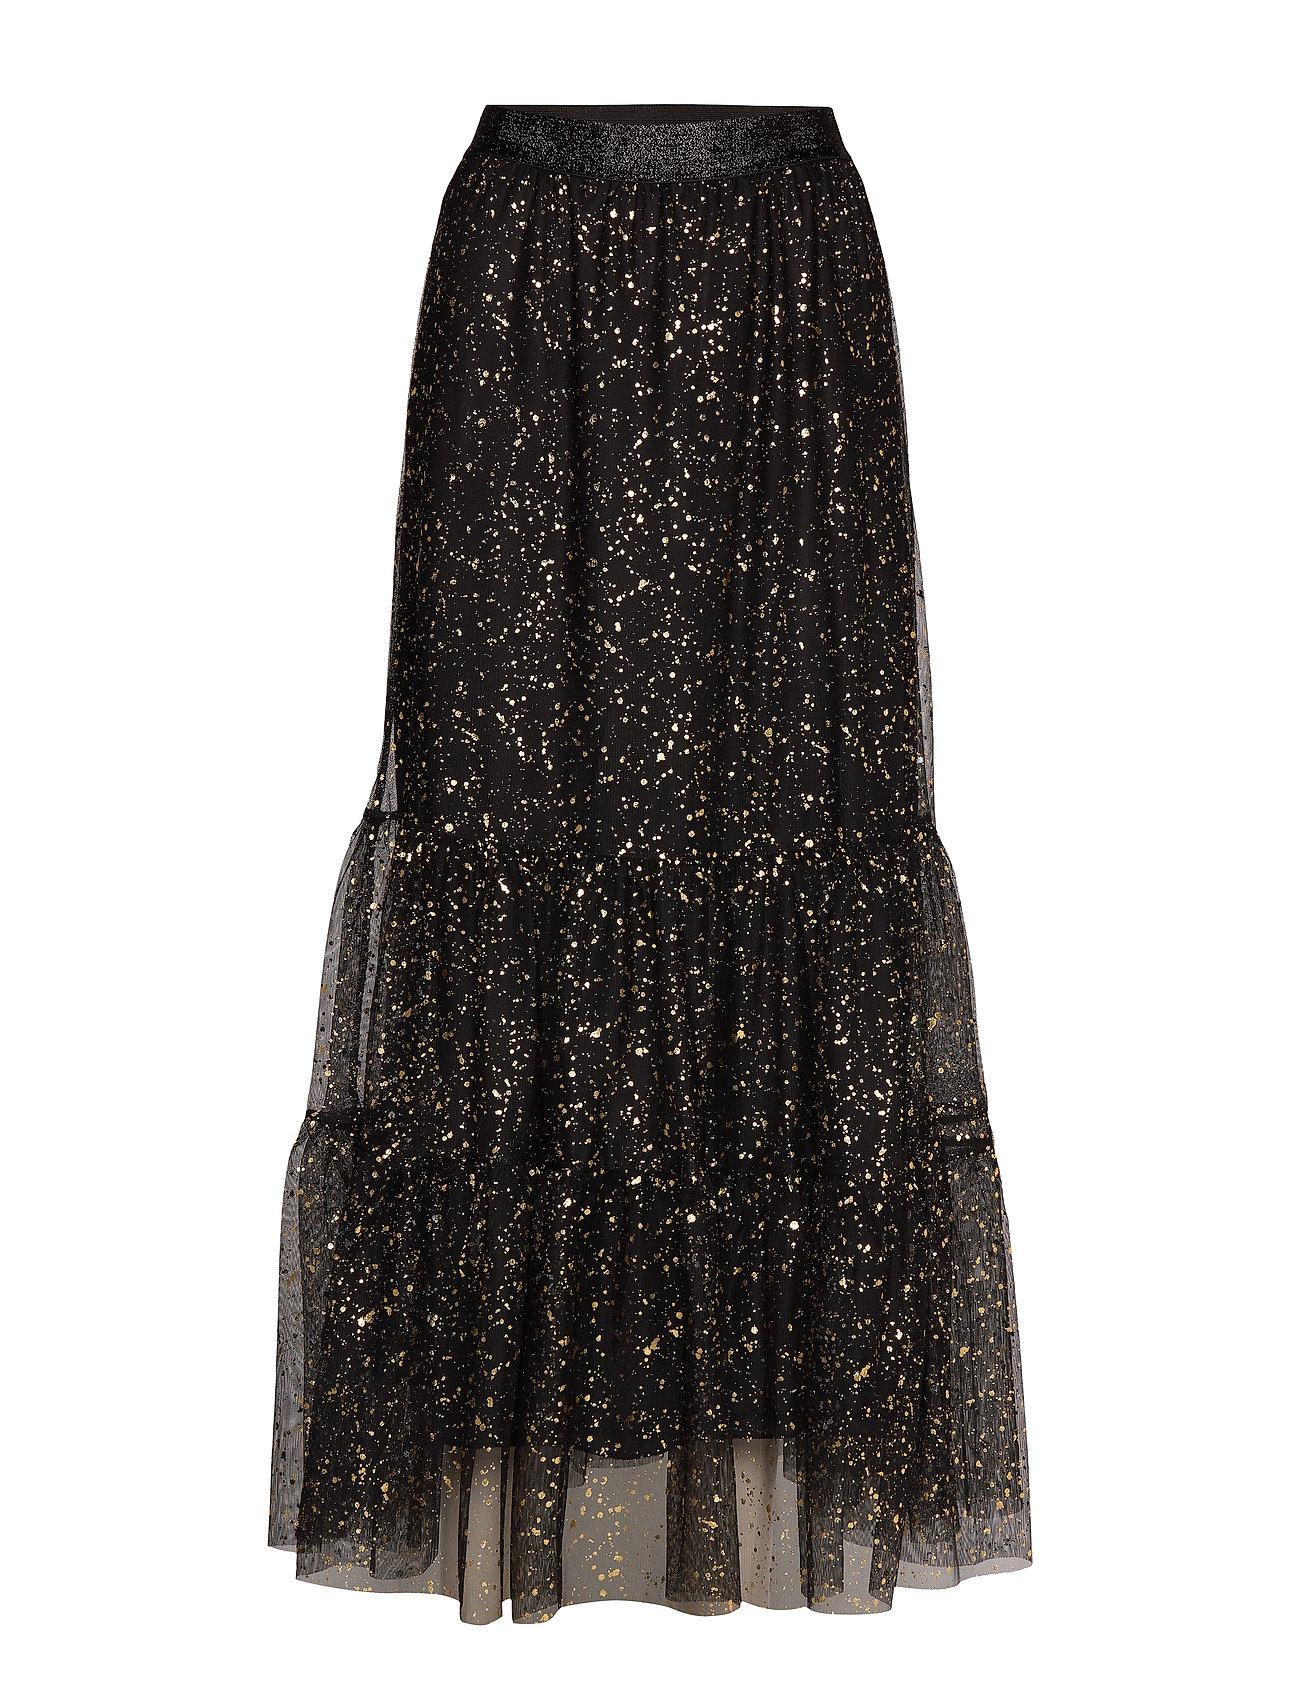 BECKSÖNDERGAARD Paint Dot Nynne Skirt - BLACK